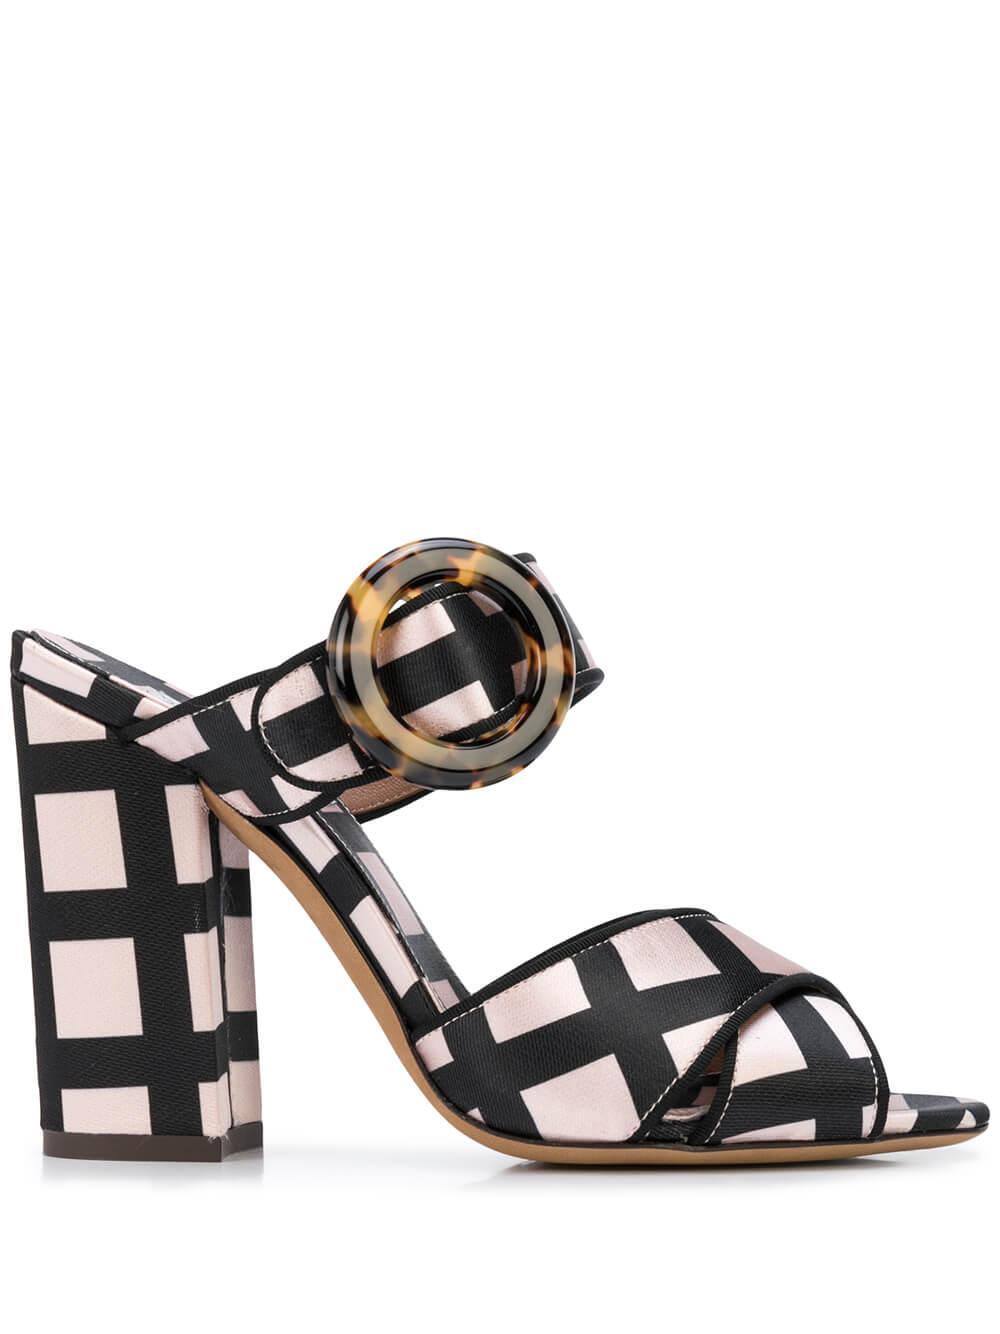 Reyner Check Satin Block Heel Sandal